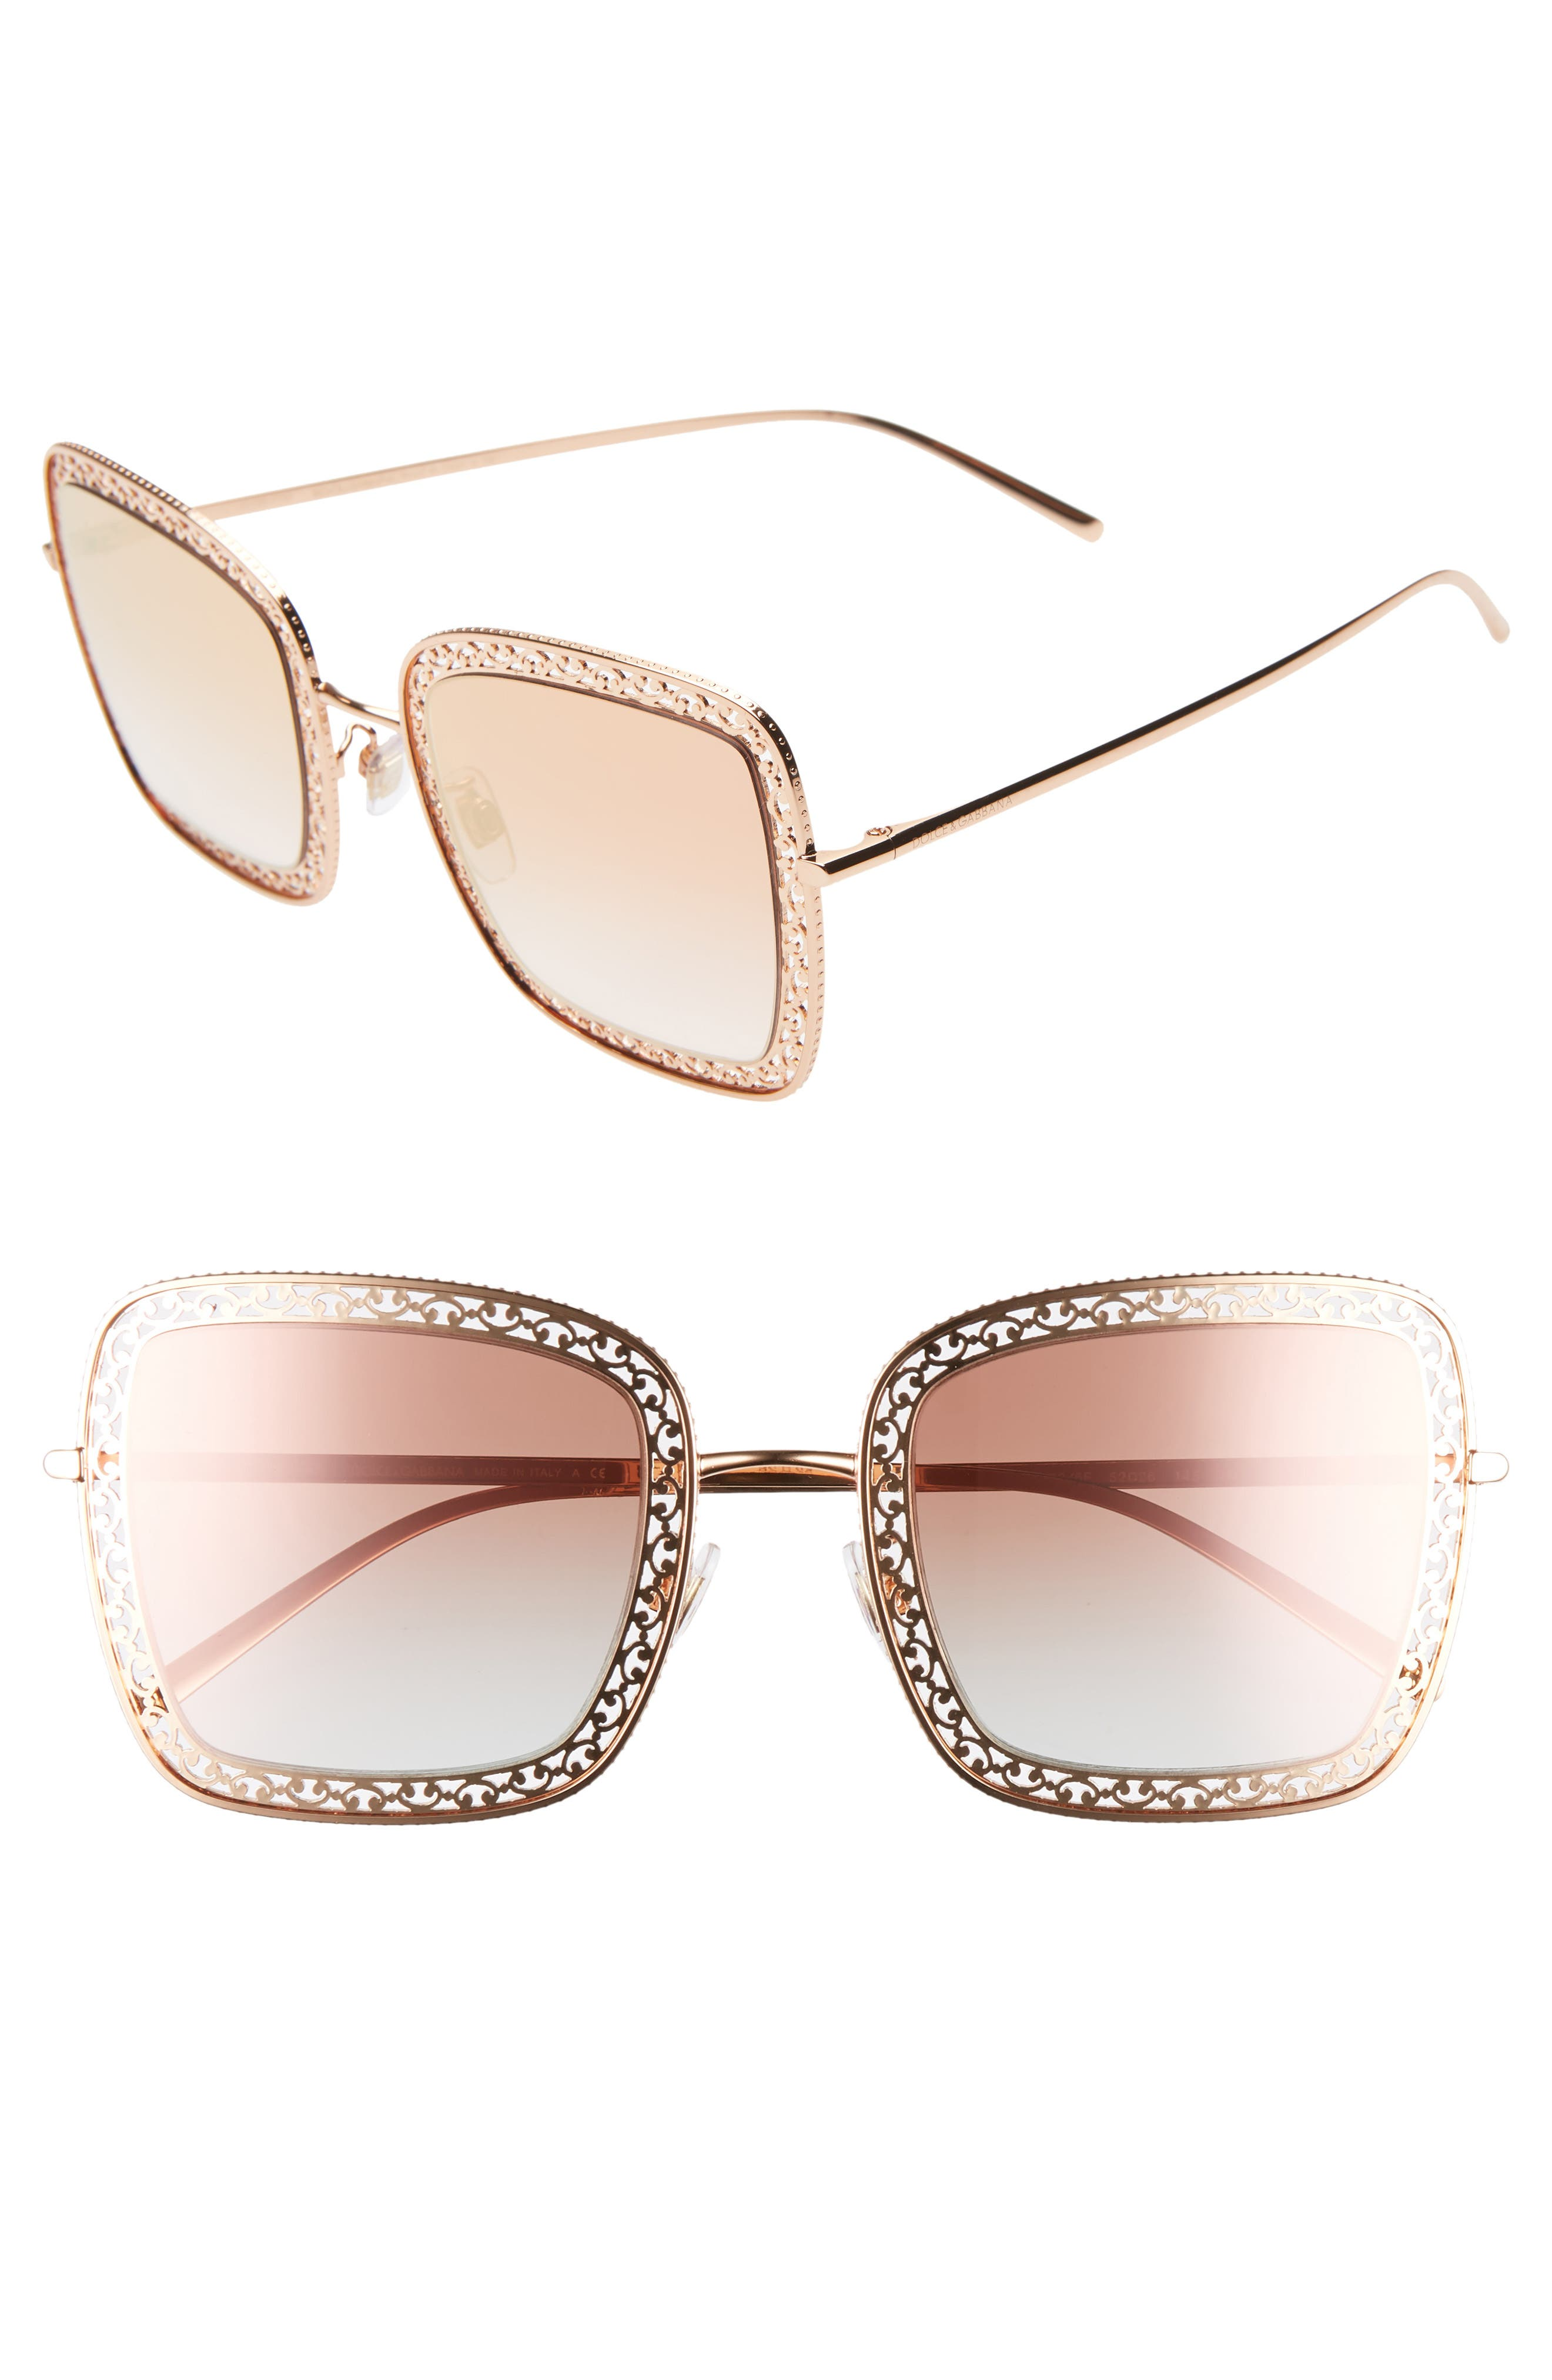 Dolce & gabbana 52Mm Square Sunglasses - Gold/ Pink